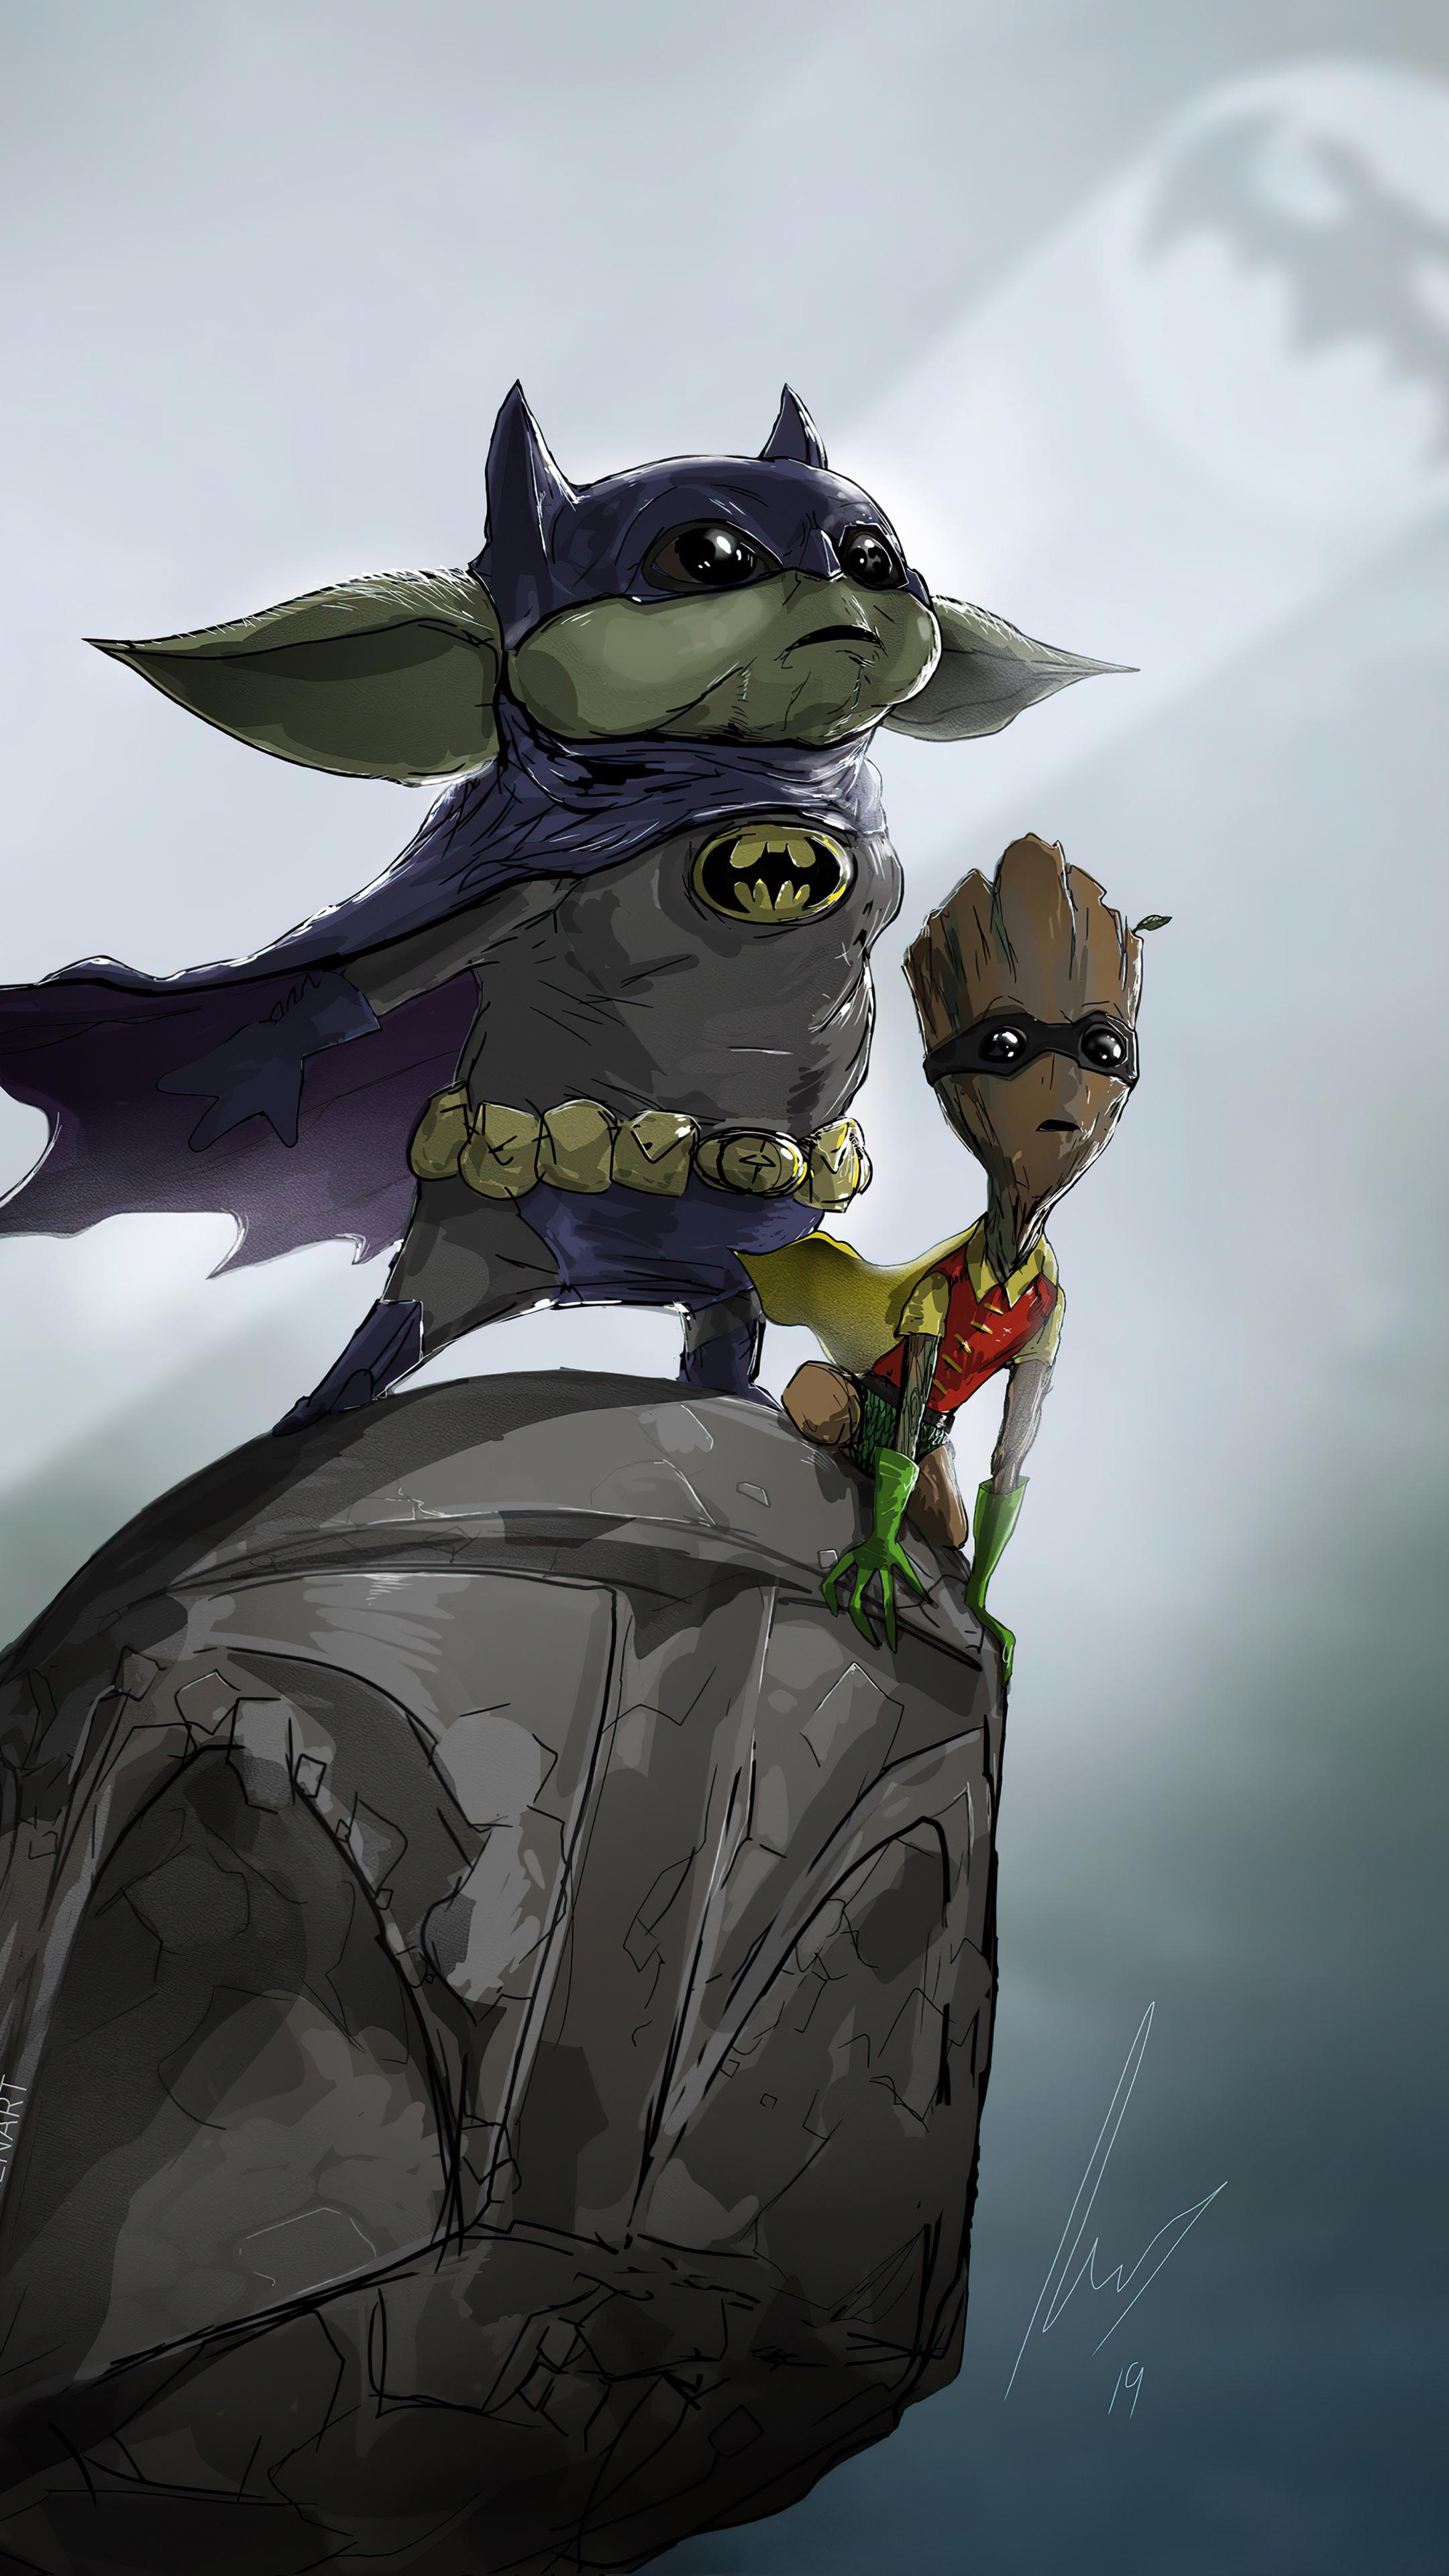 baby-groot-yoda-as-batman-and-robin-4k-w0.jpg